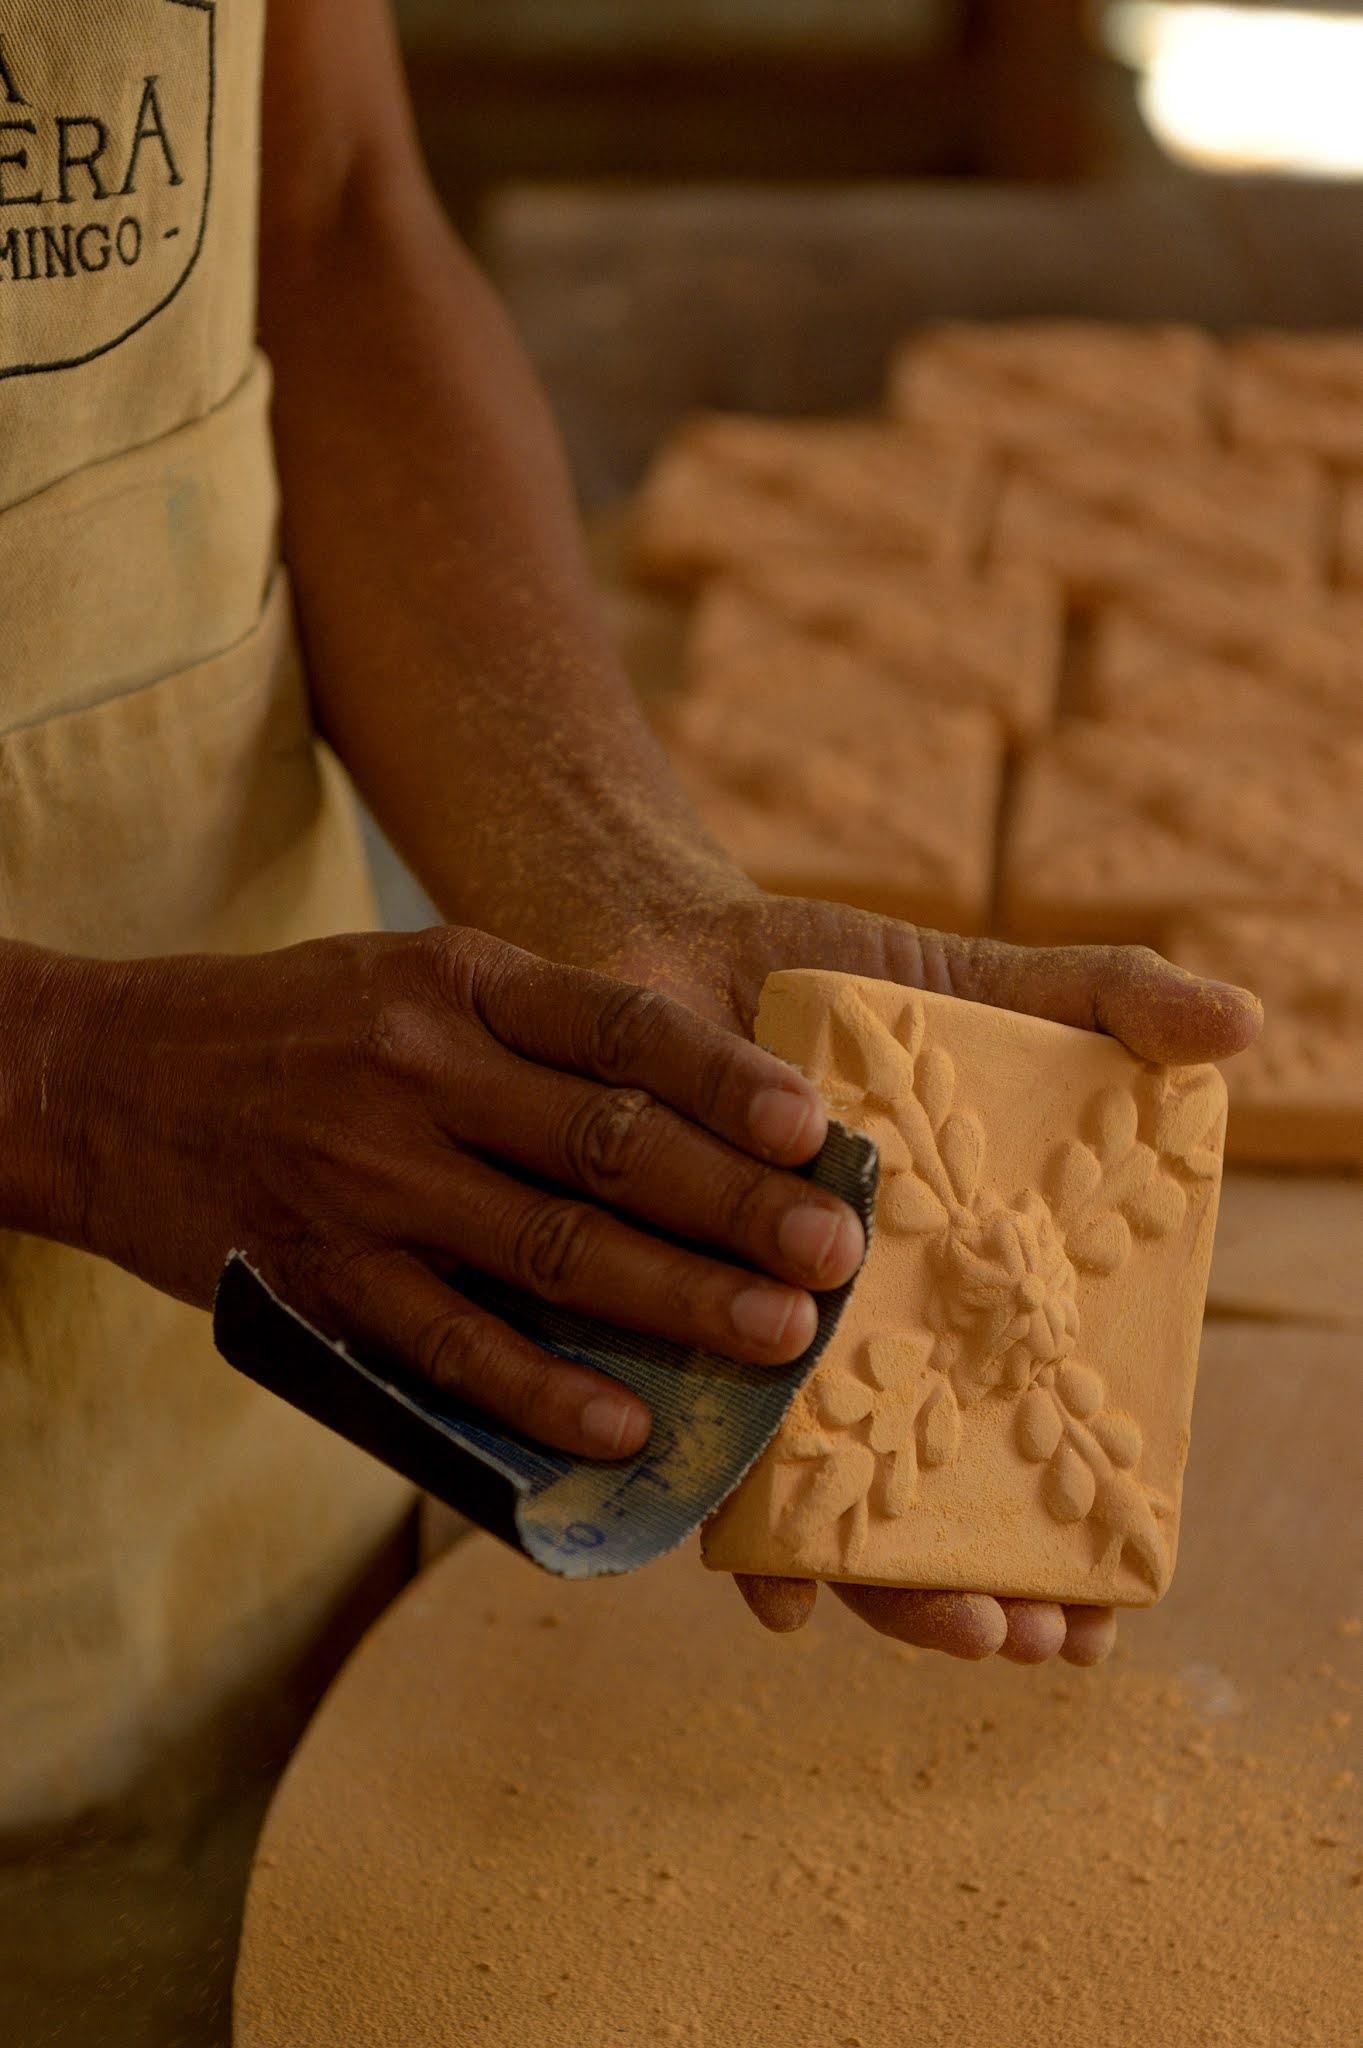 Casa Alfarera, Arte Boheme, Ceramic Shop, Dominican Republic, Dominican Republic Ceramic Shop, Ysabela Molini, Republica Dominicana, Ceramica dominicana, Ceramic Studio